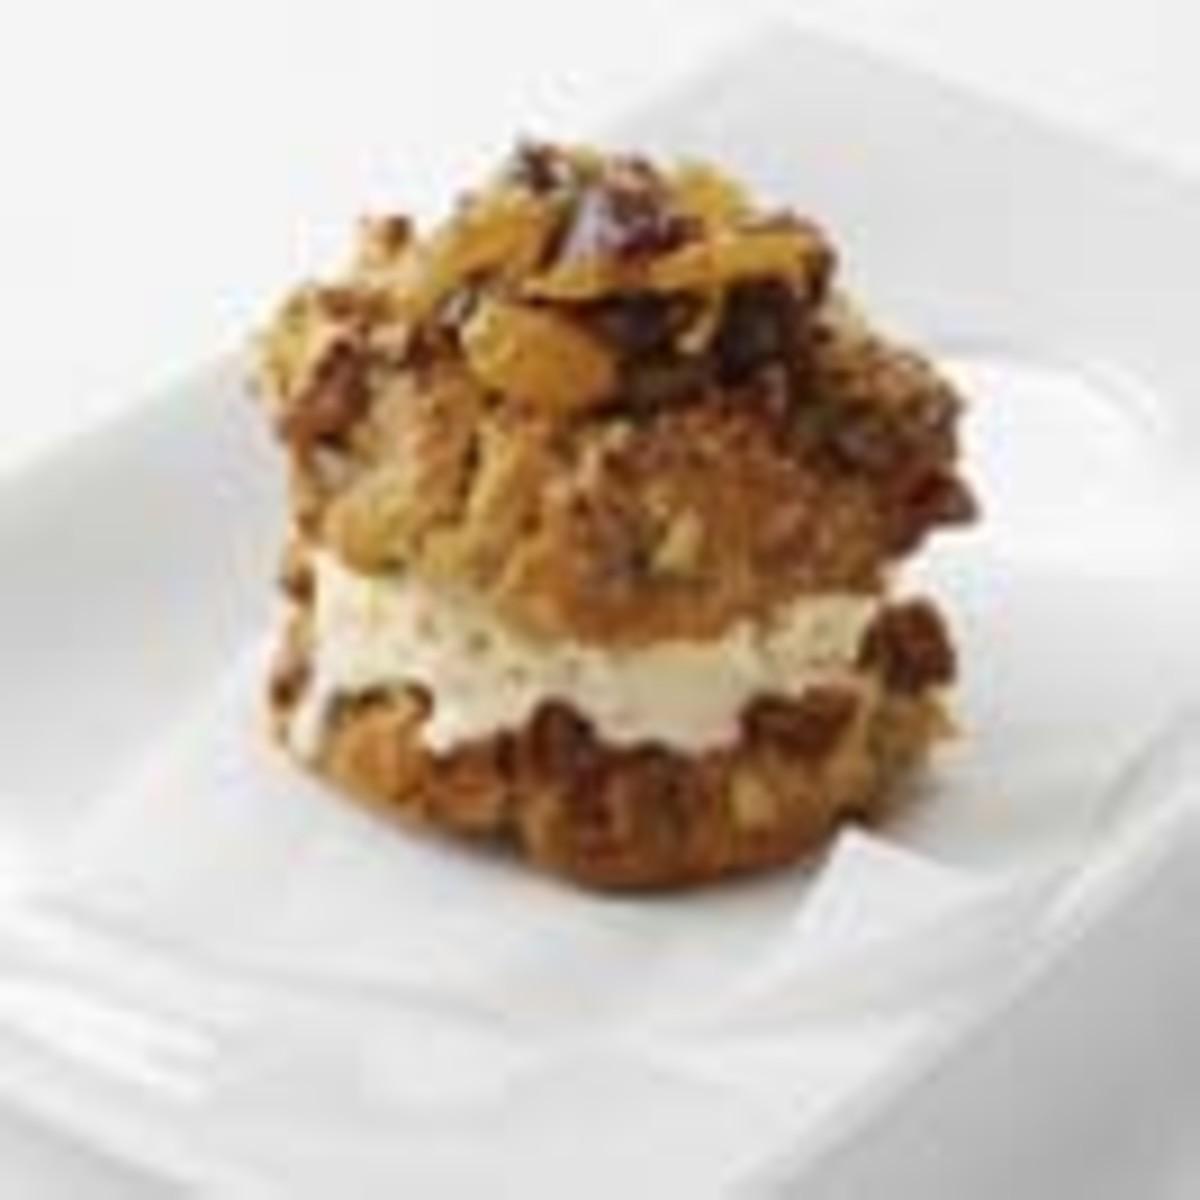 Pecan Thumbprint Cookies with California Golden Raisin-Dried Cherry Marmalade